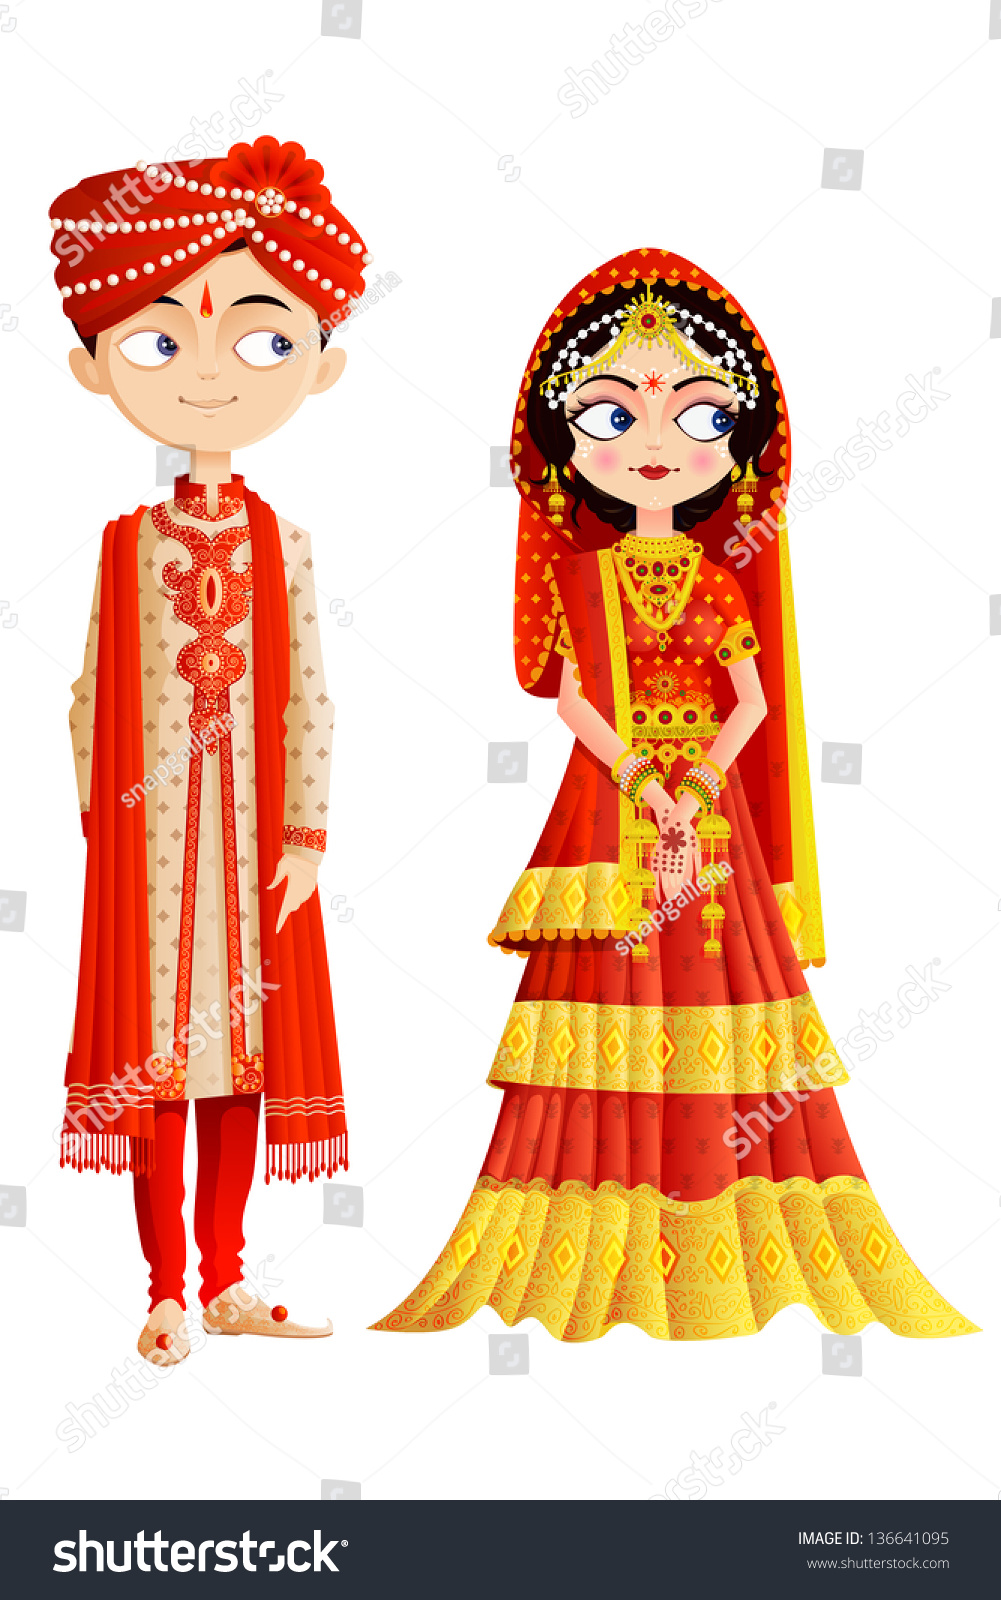 Easy Edit Vector Illustration Indian Wedding Stock Vector ...